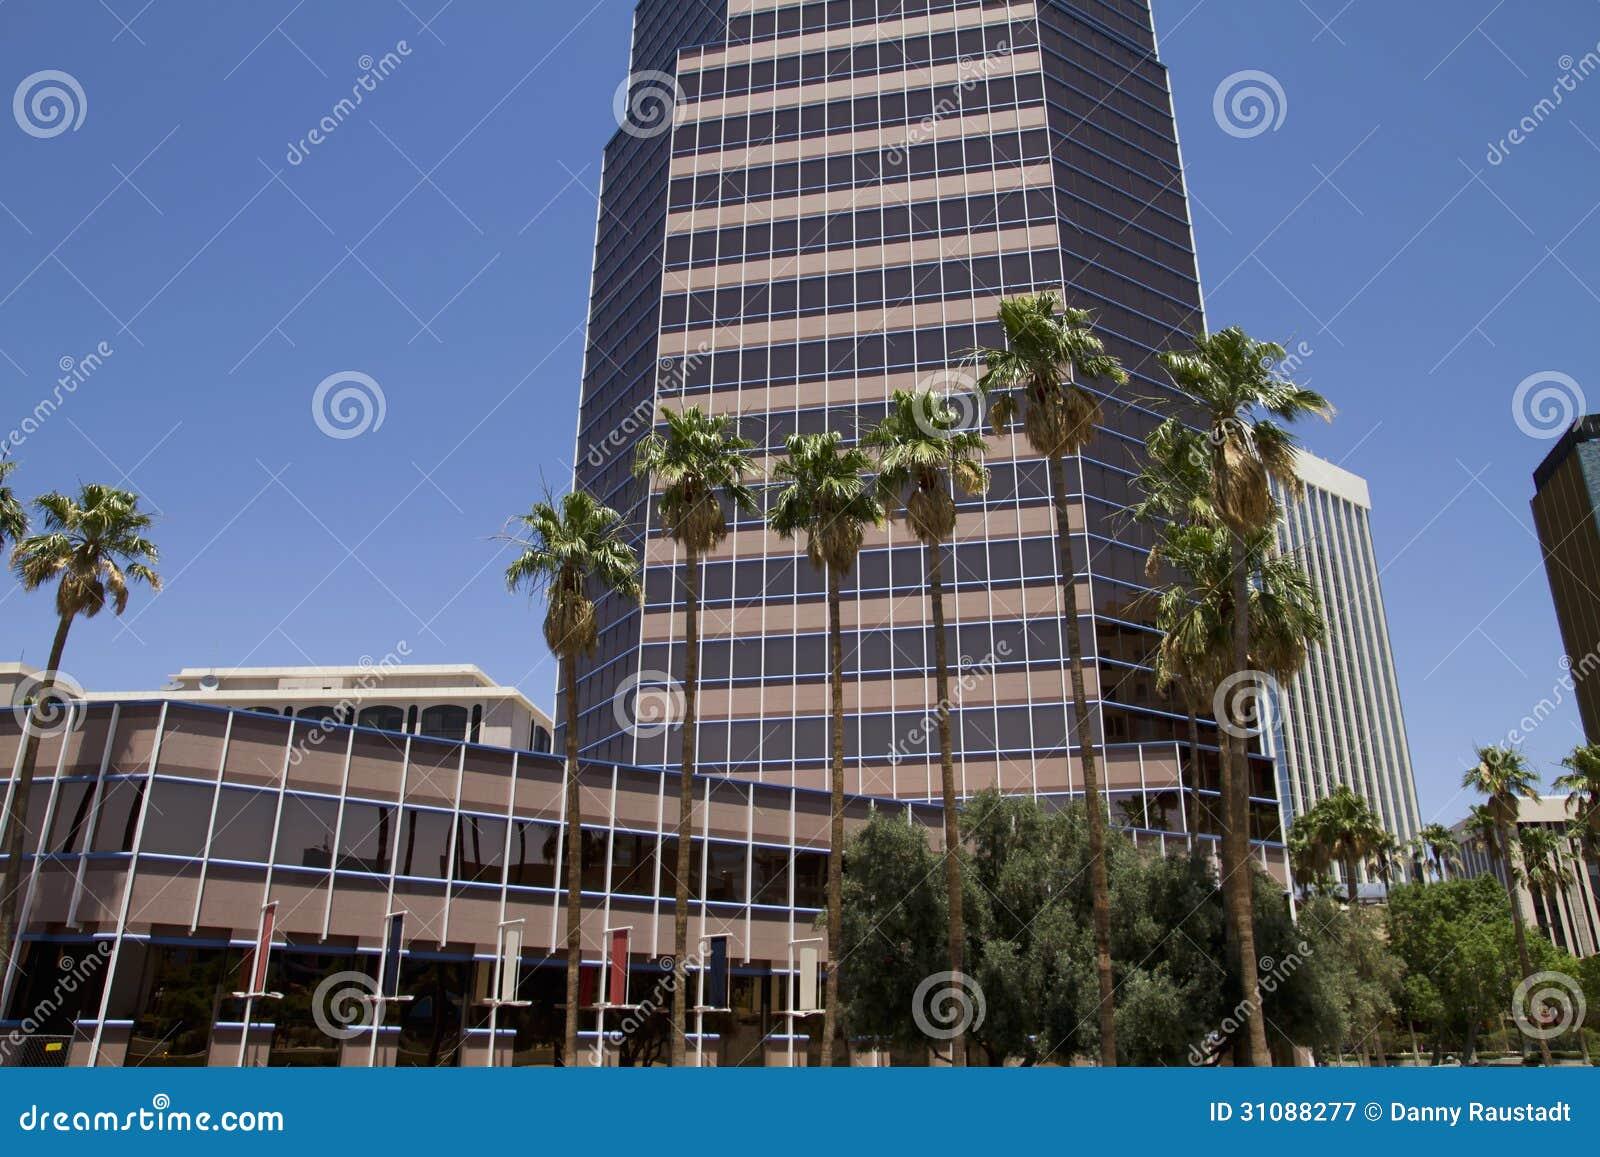 downtown tucson arizona royalty free stock photography